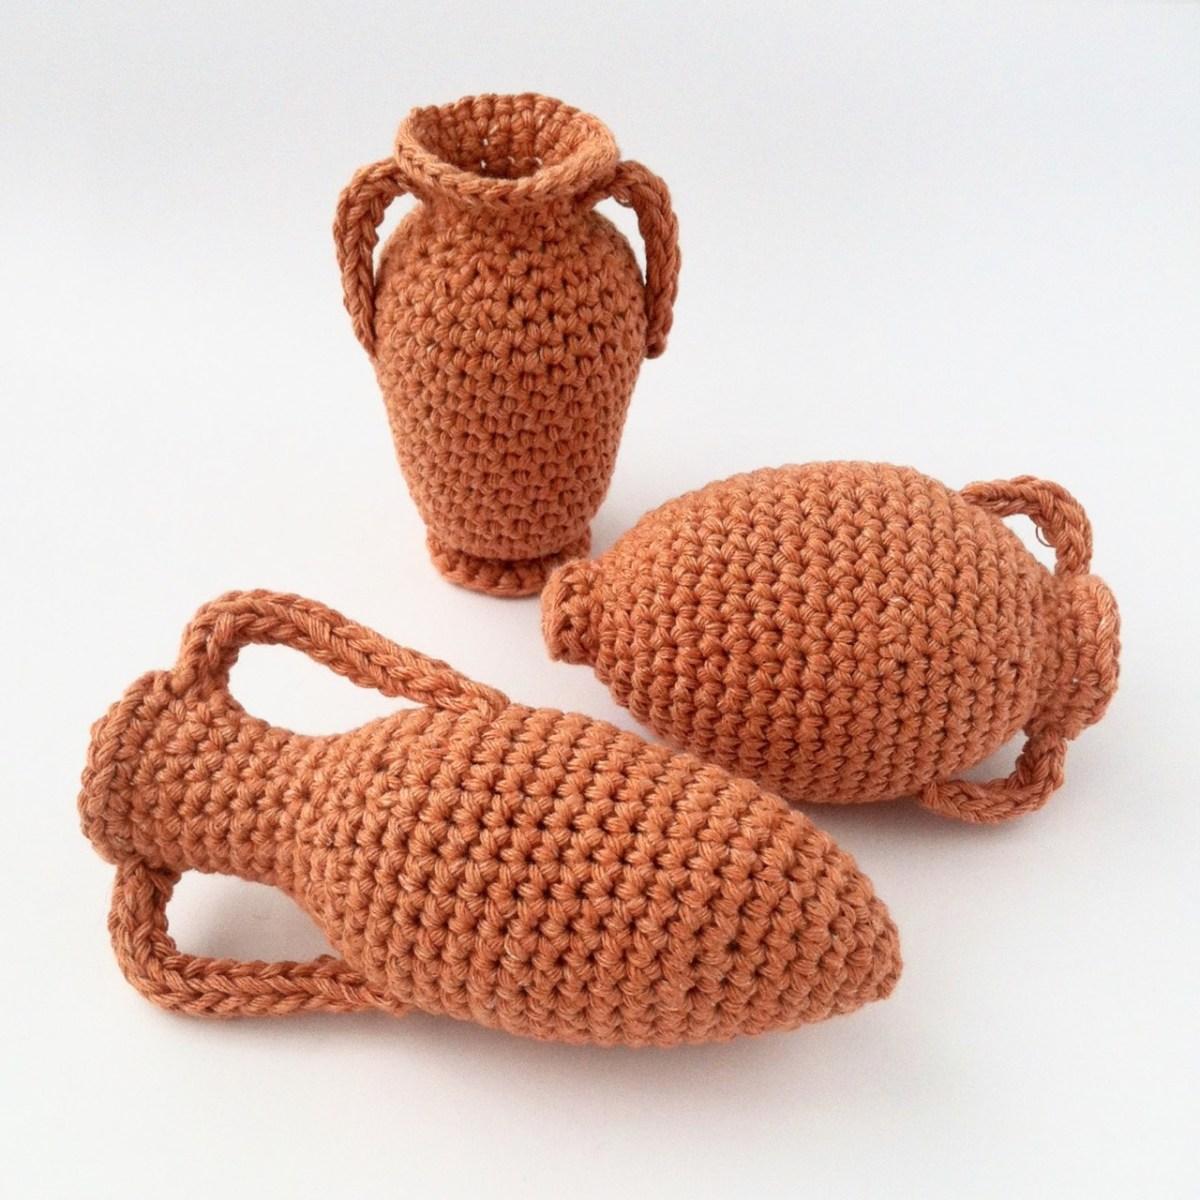 Crocheted Amphorae